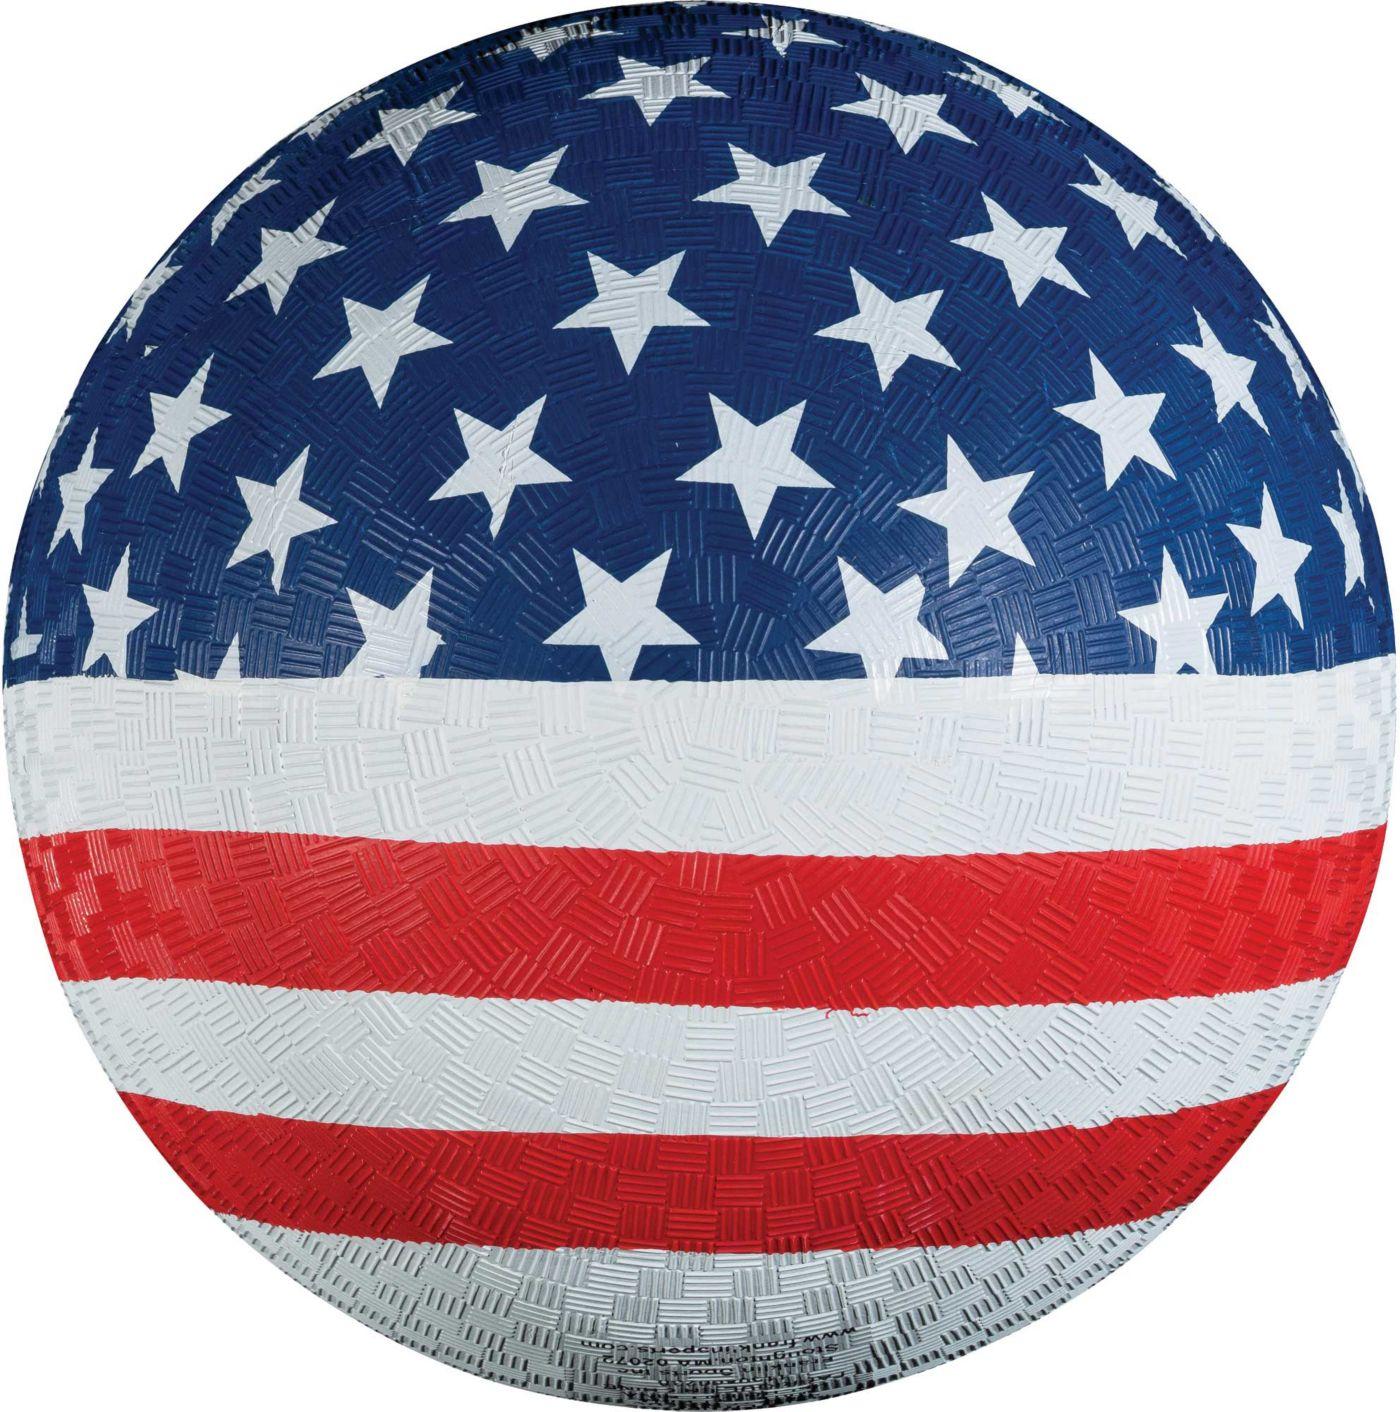 Franklin 8.5'' USA Playground Ball